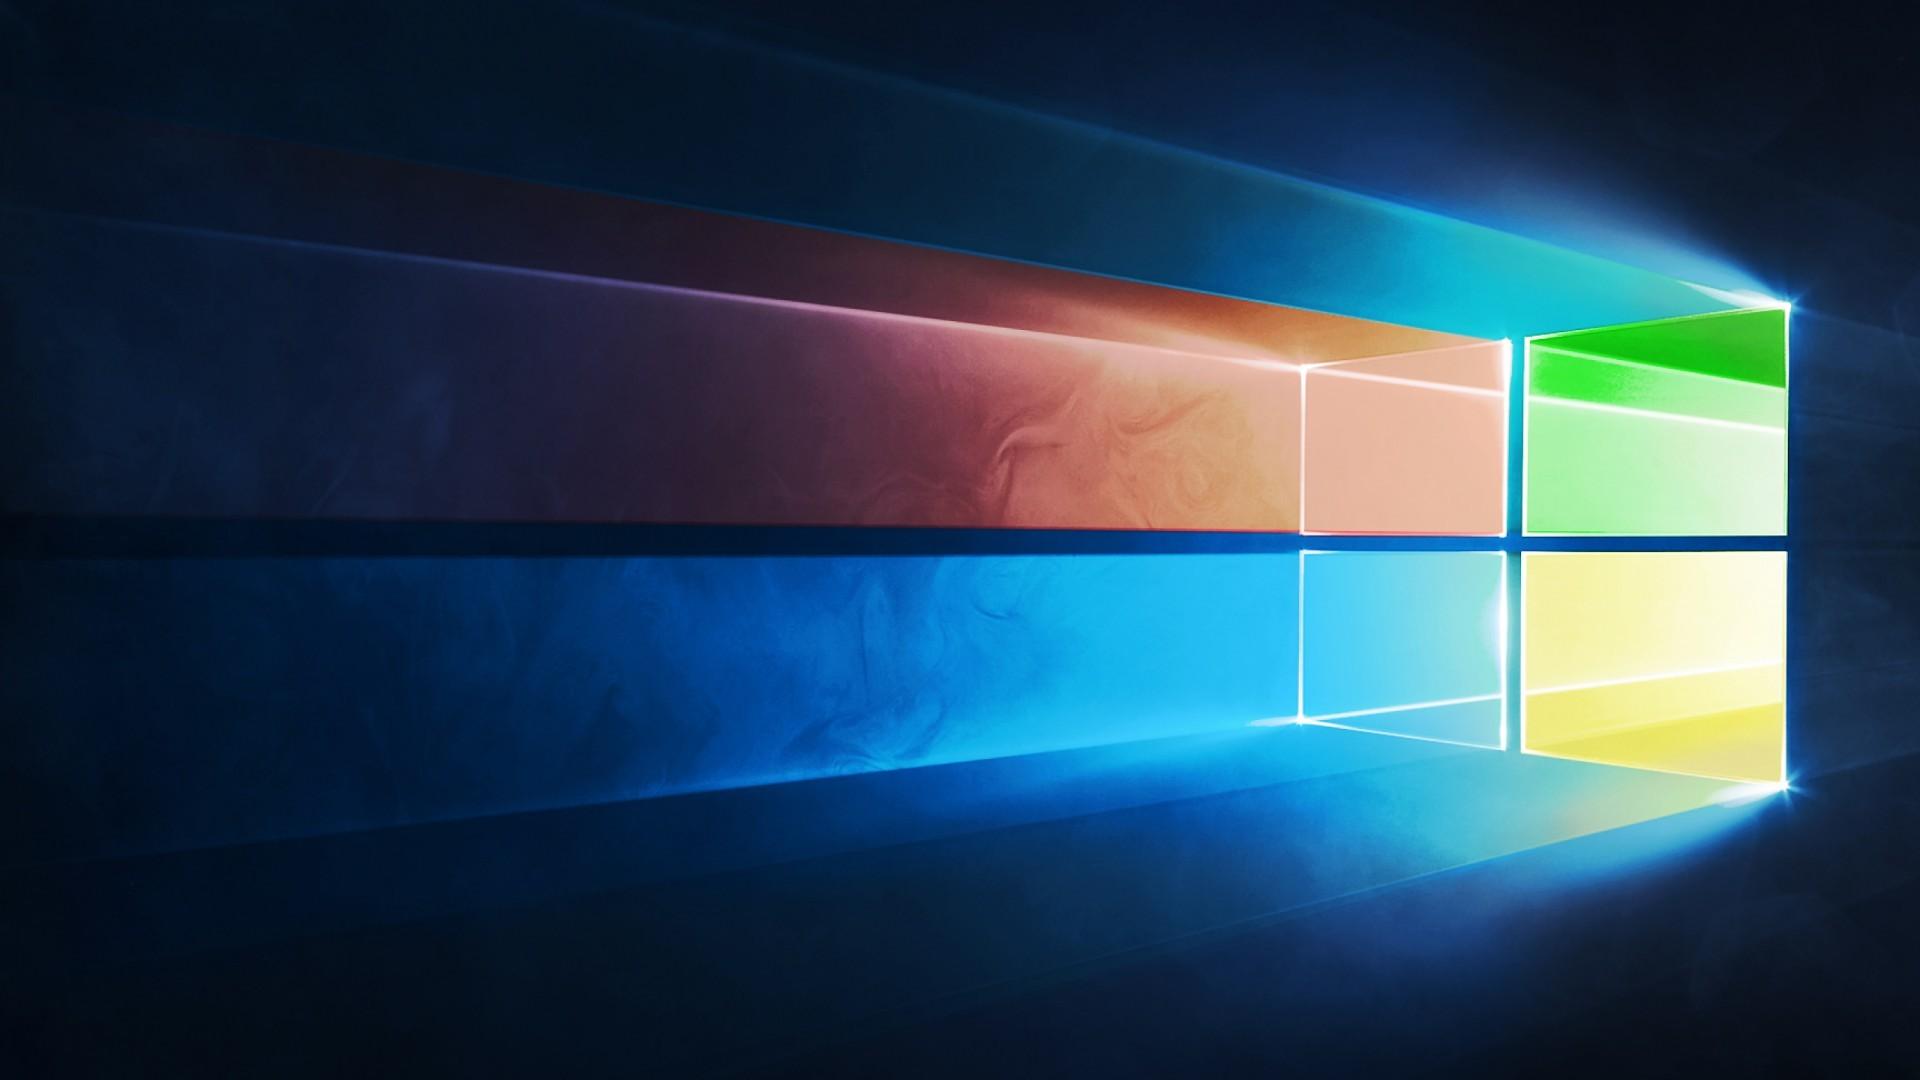 windows,  microsoft, anniversary, update, кот  № 1182256 бесплатно